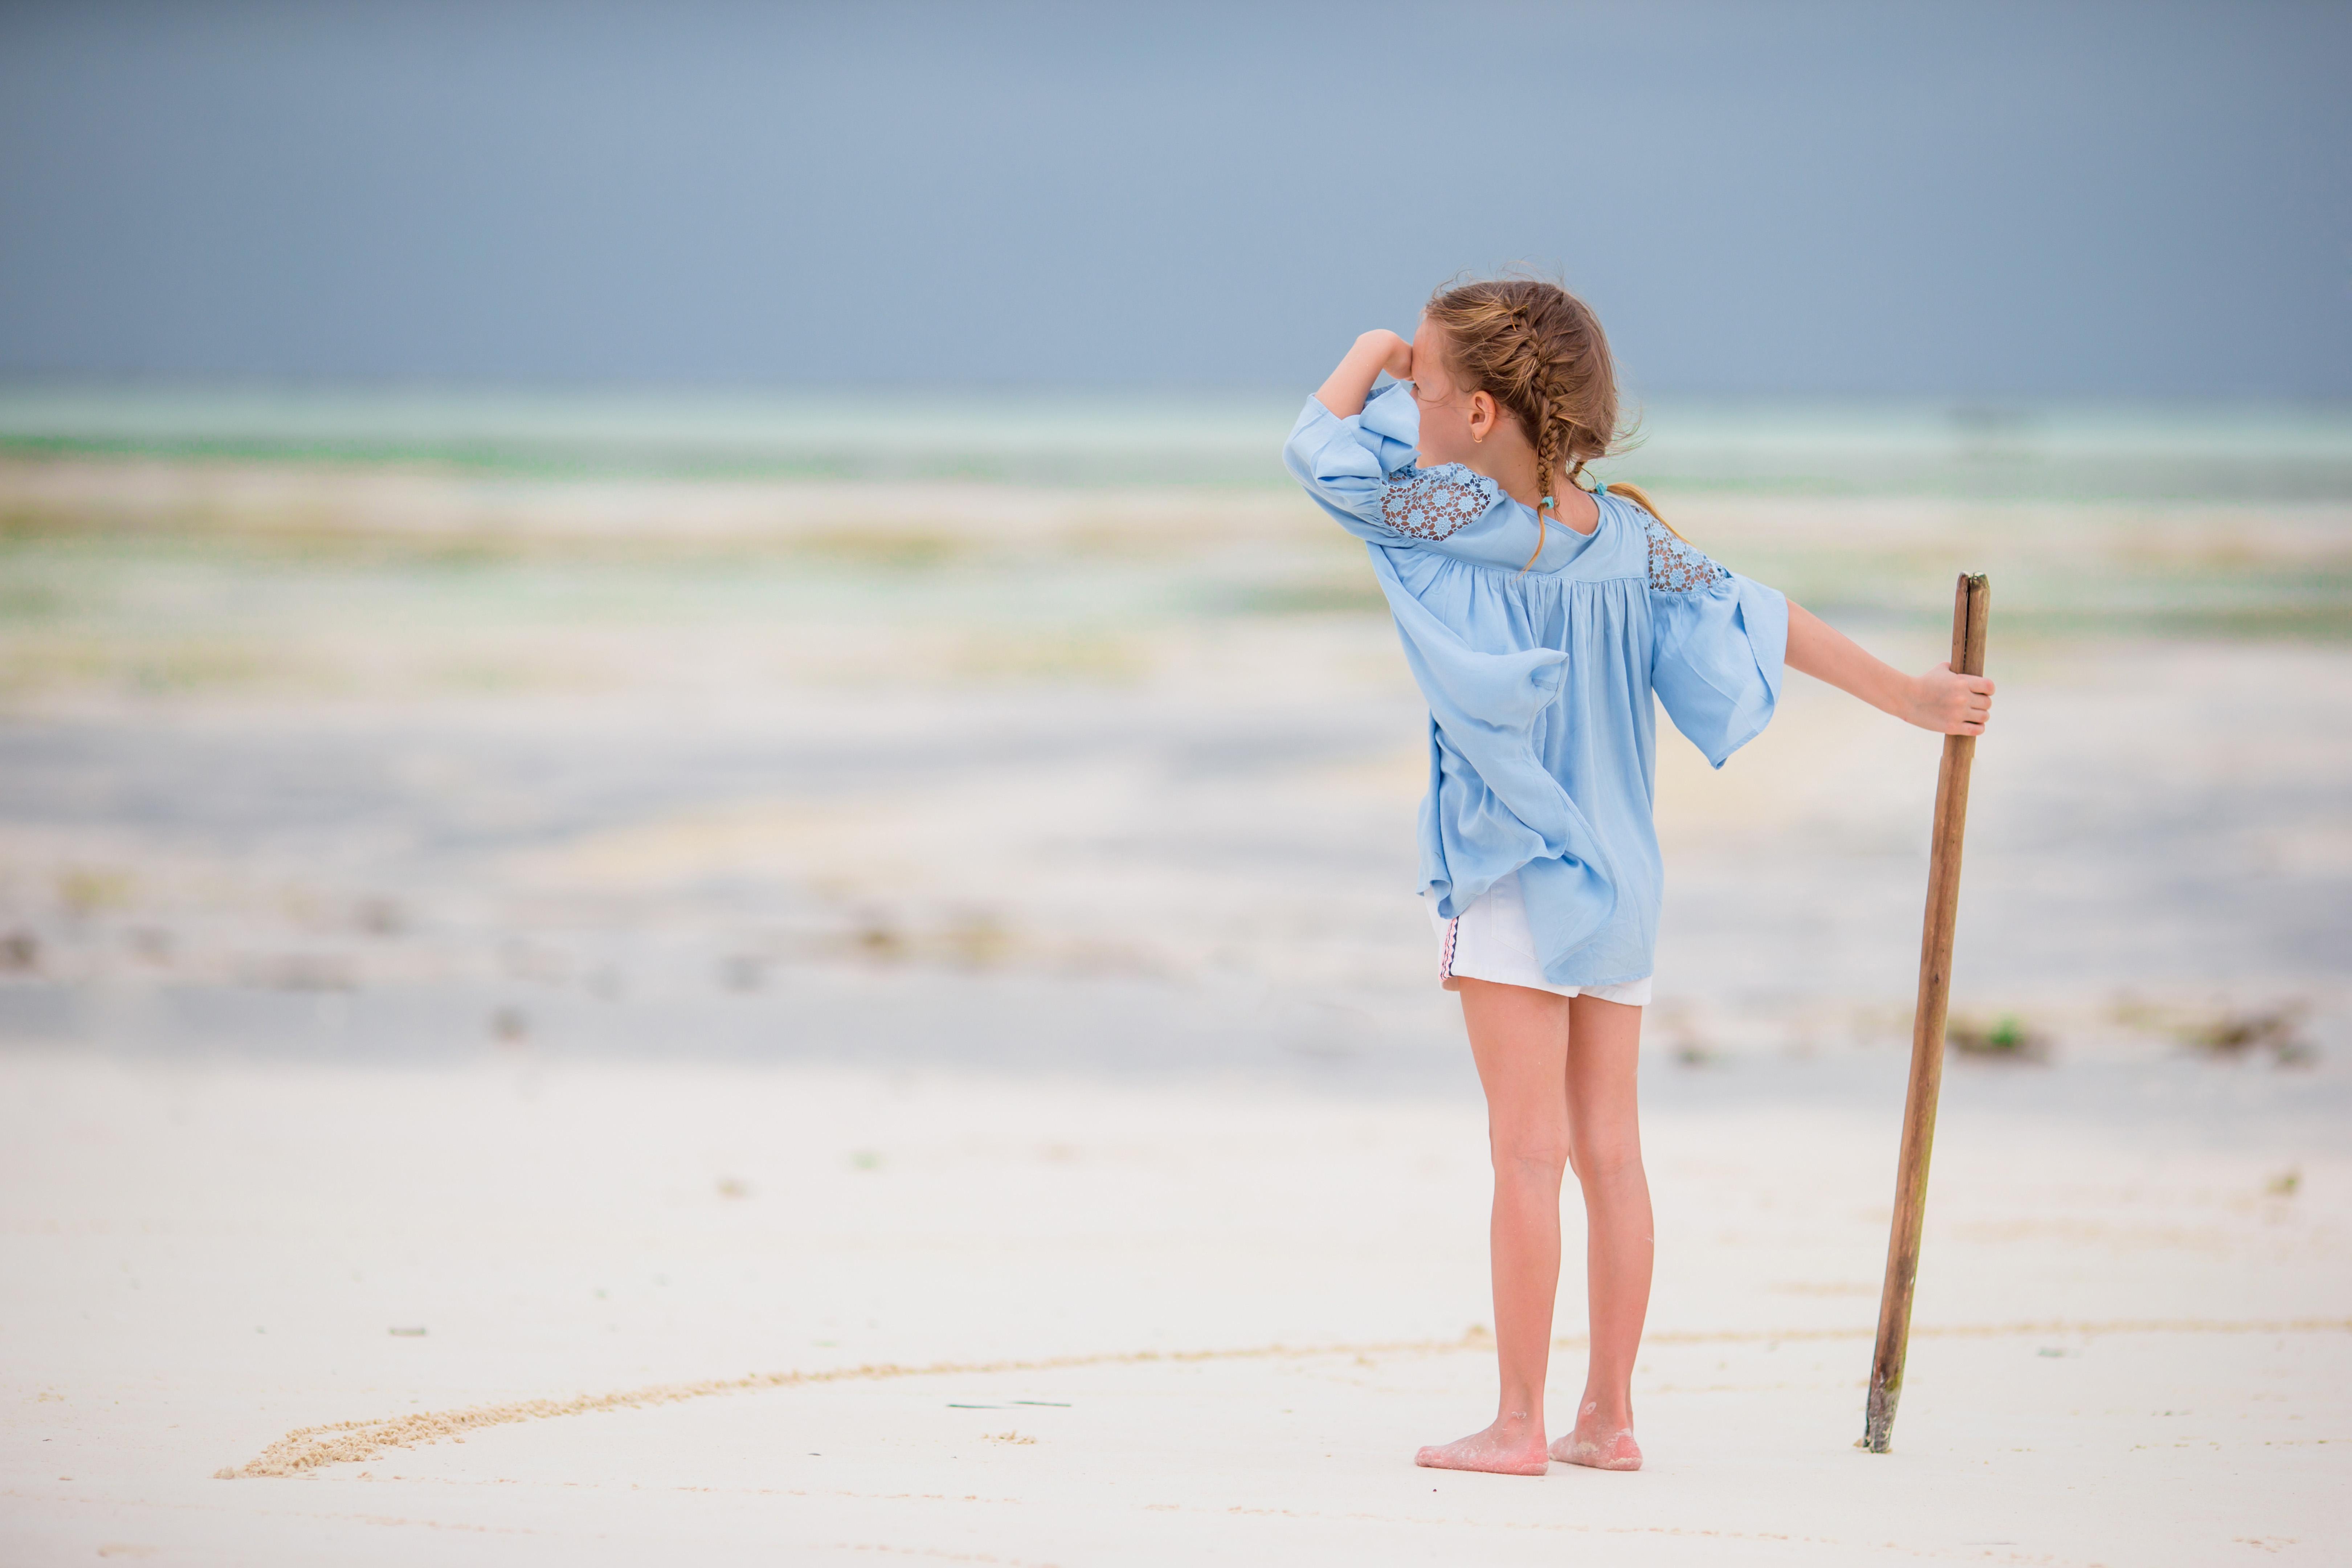 Adorable little girl on beach vacation having fun